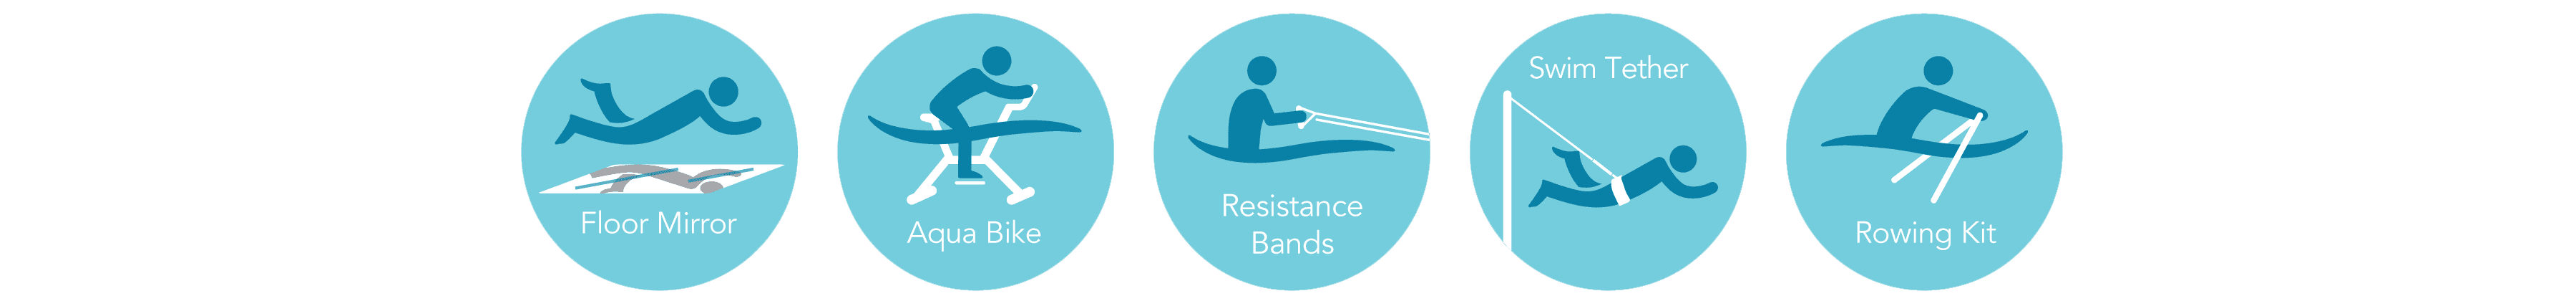 fitness-accessories-swimcross-a